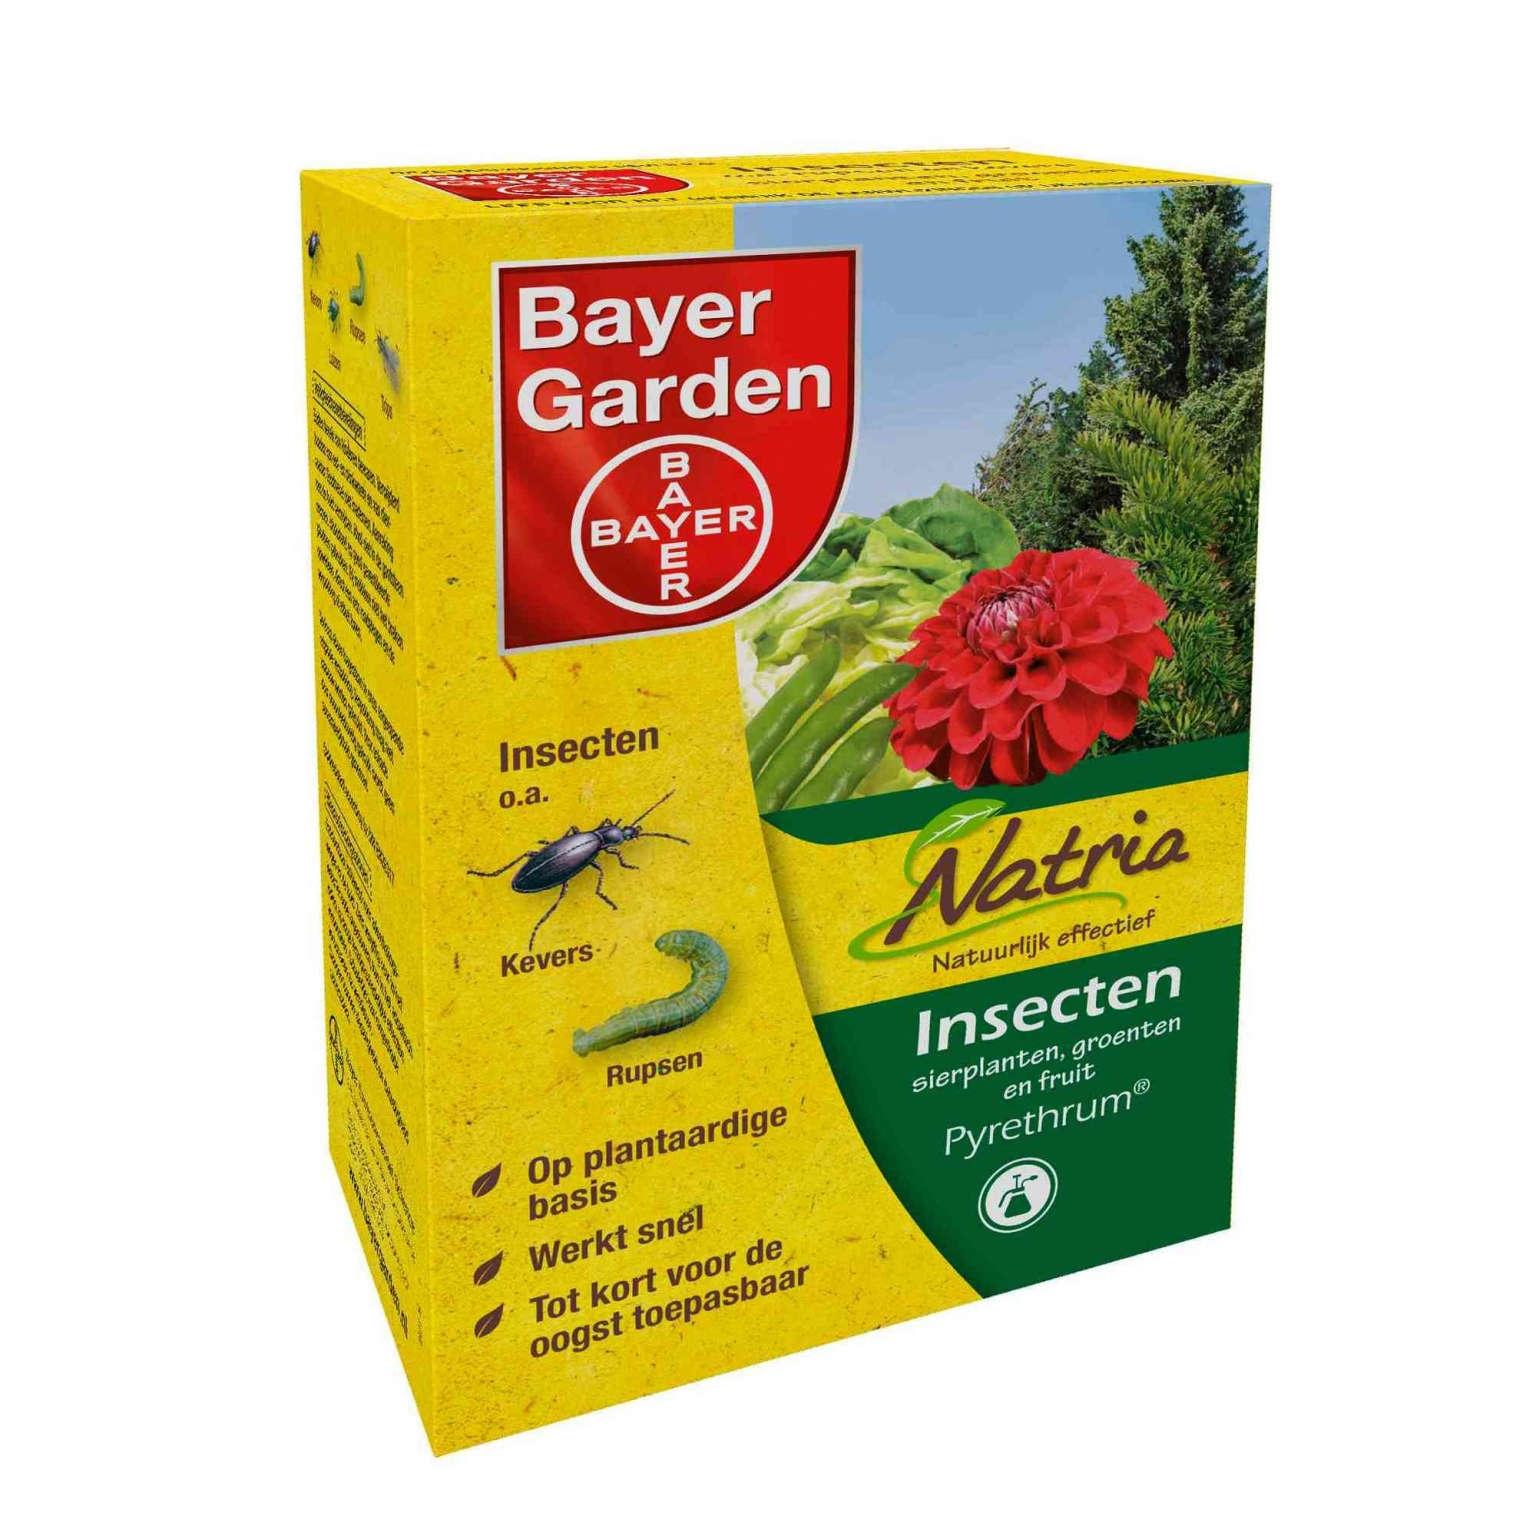 Bayer buxusmot bestrijding